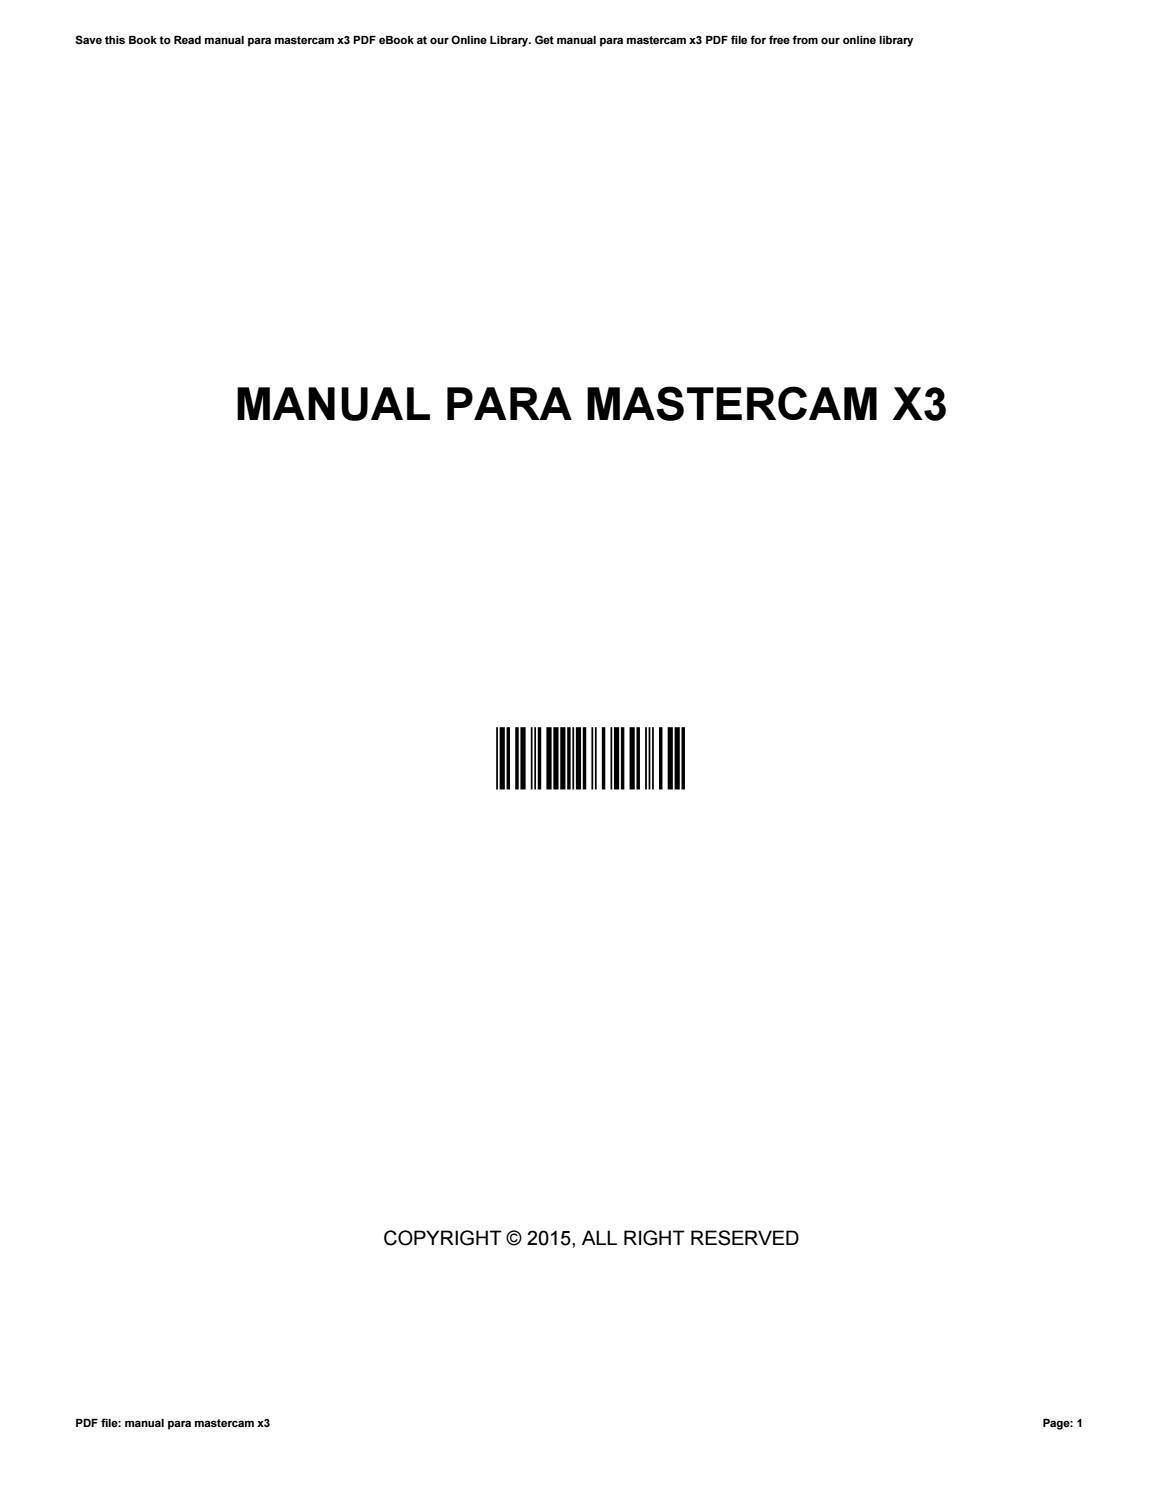 Manual de beta bk 150 ebook screenshot image array svensk manual till mastercam x3 online user manual u2022 rh pandadigital co fandeluxe Gallery